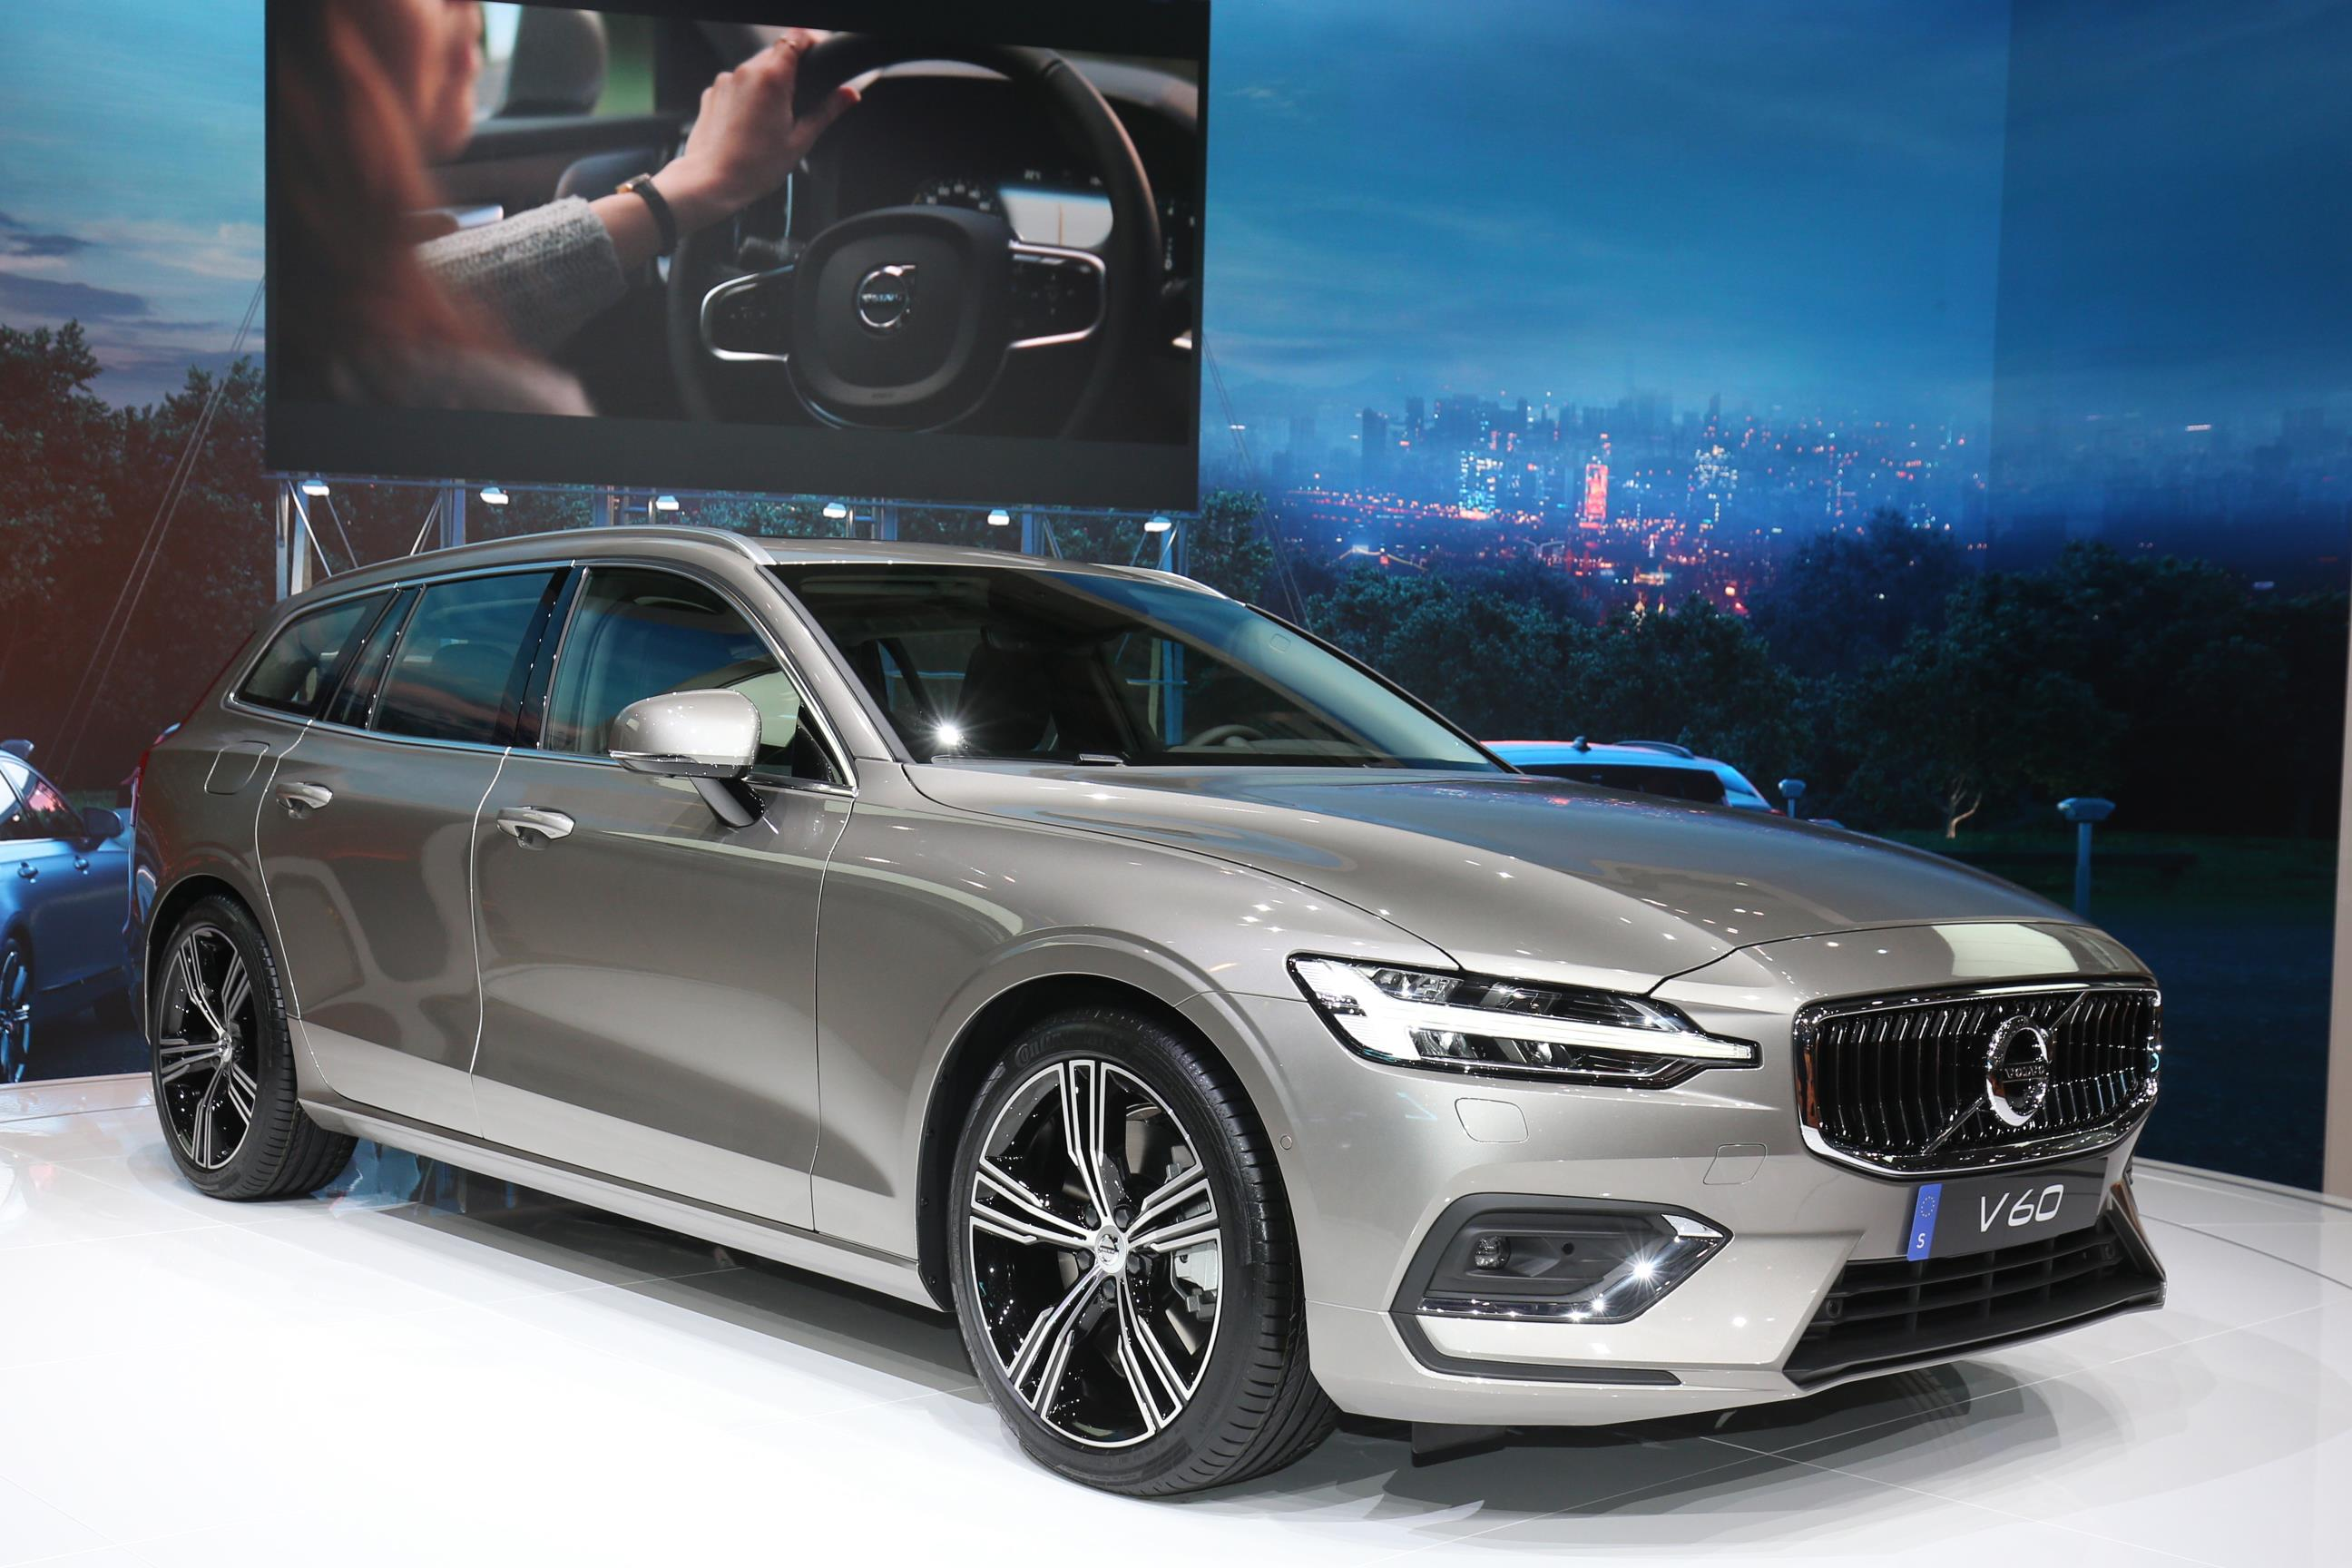 Geneva Motor Show 2018 Mega Gallery Part 2 (313)